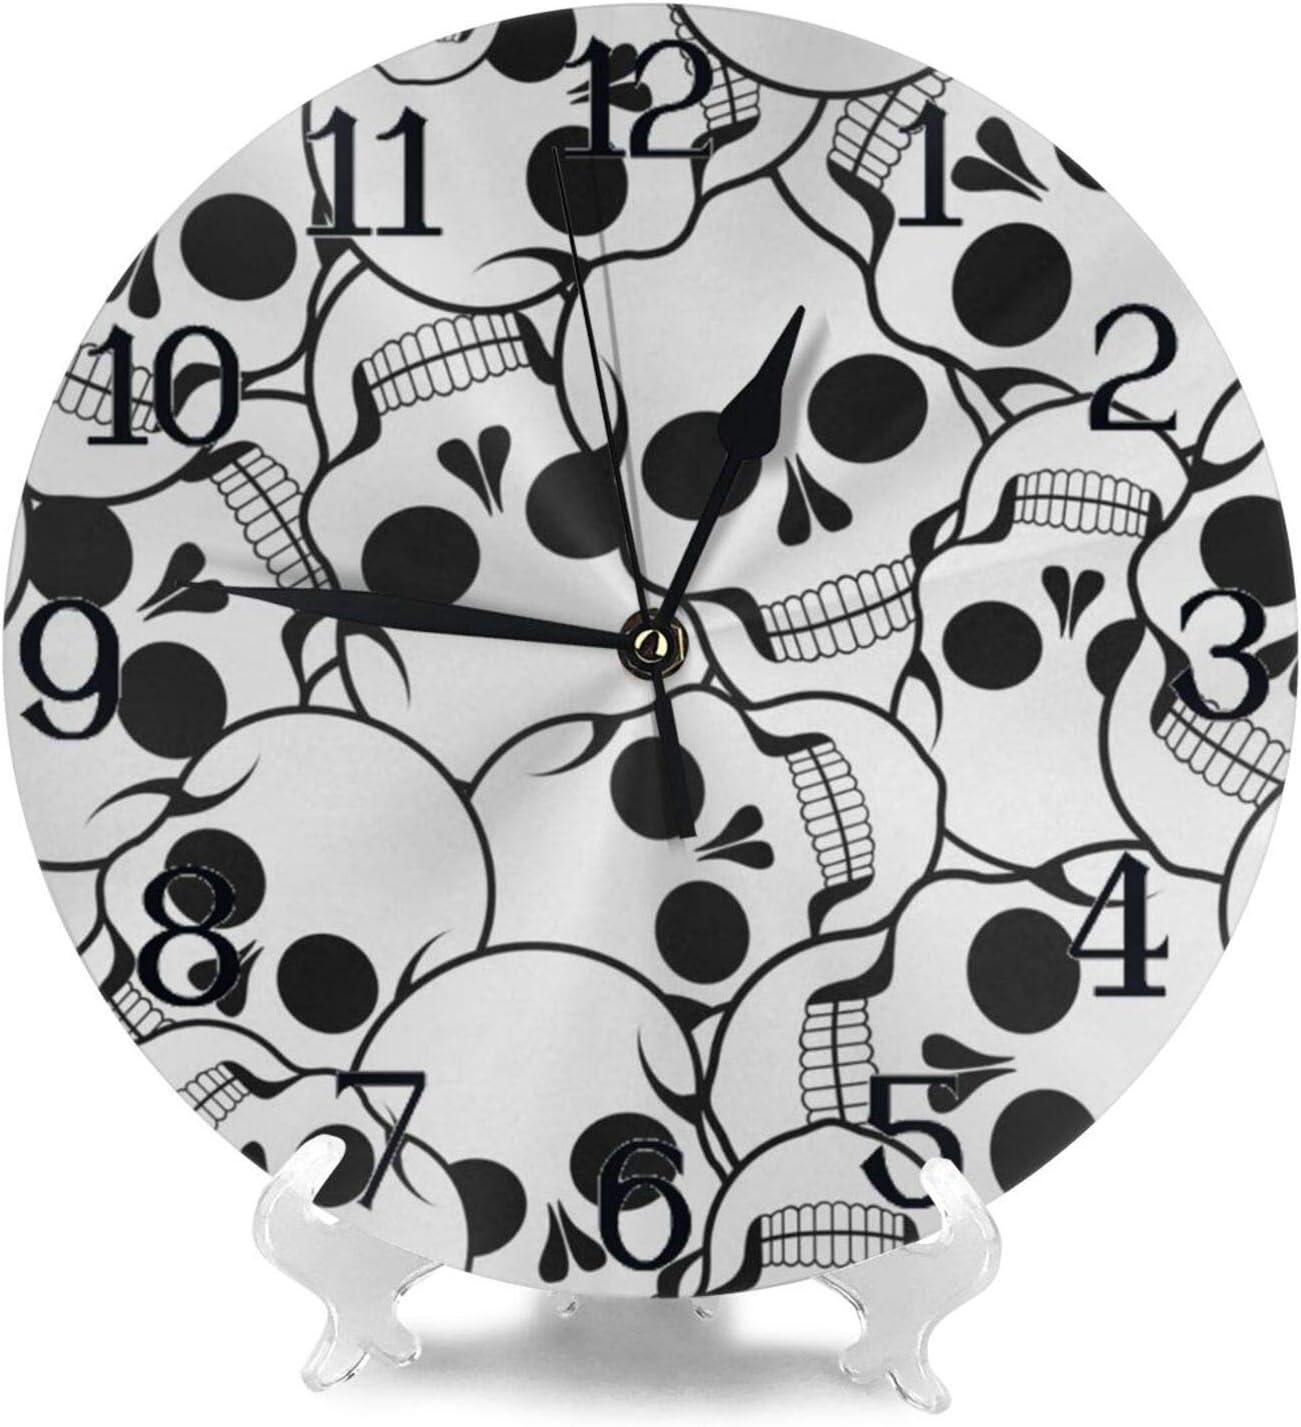 Wall Clock Large Halloween Skulls Pattern Non Ticking Kitchen Bedroom Bathroom Wall Clocks Battery Operated Silent Outdoor Desk Cute Clock Living Room Decor for Kids Womens